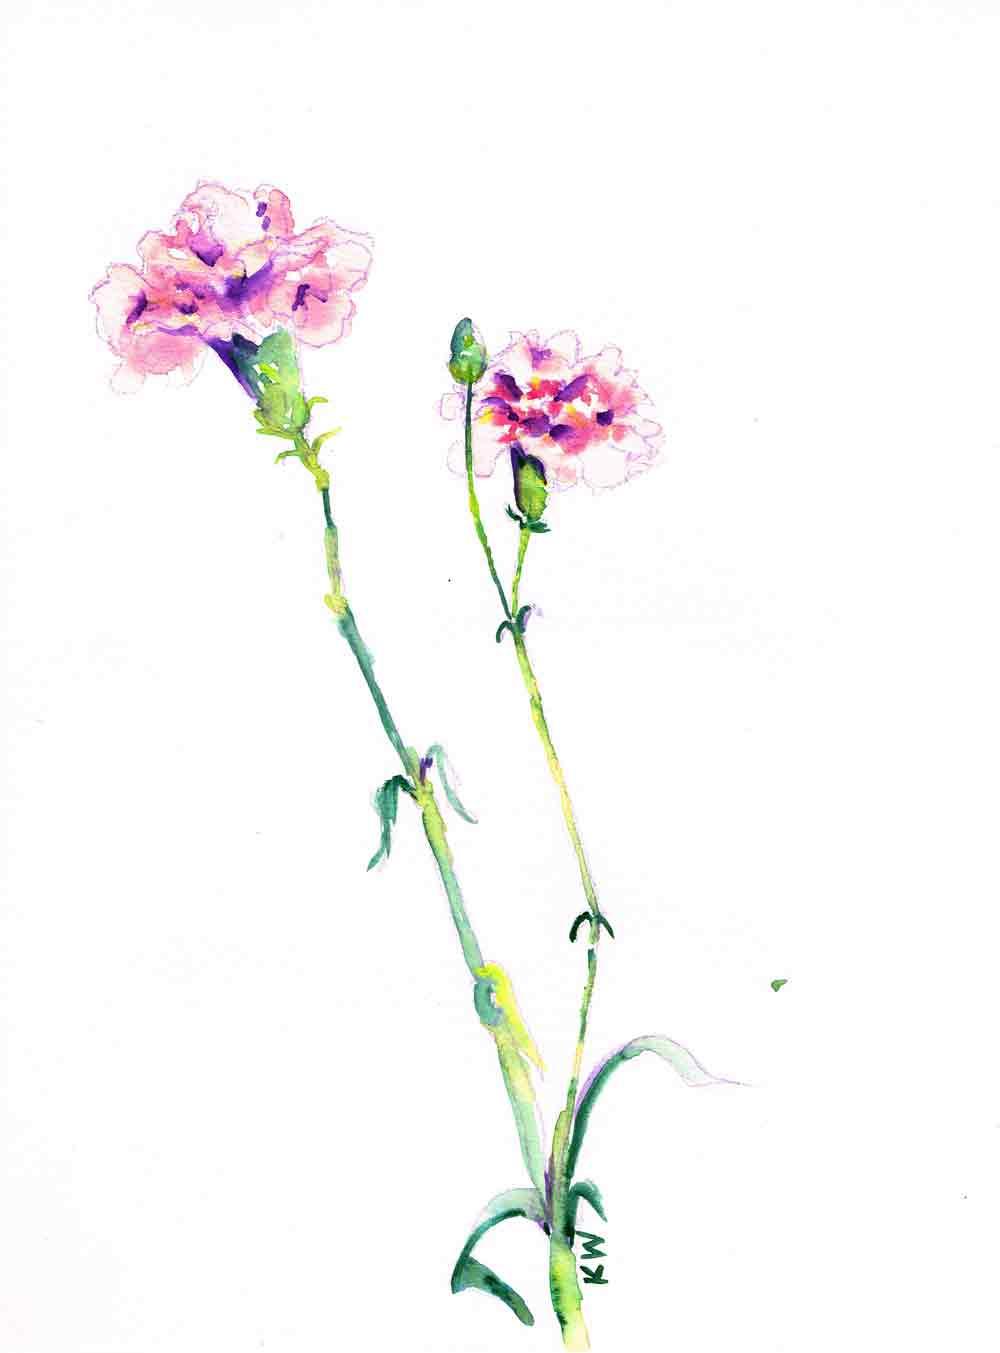 Fresh-flowers-scan-no-5-kw.jpg